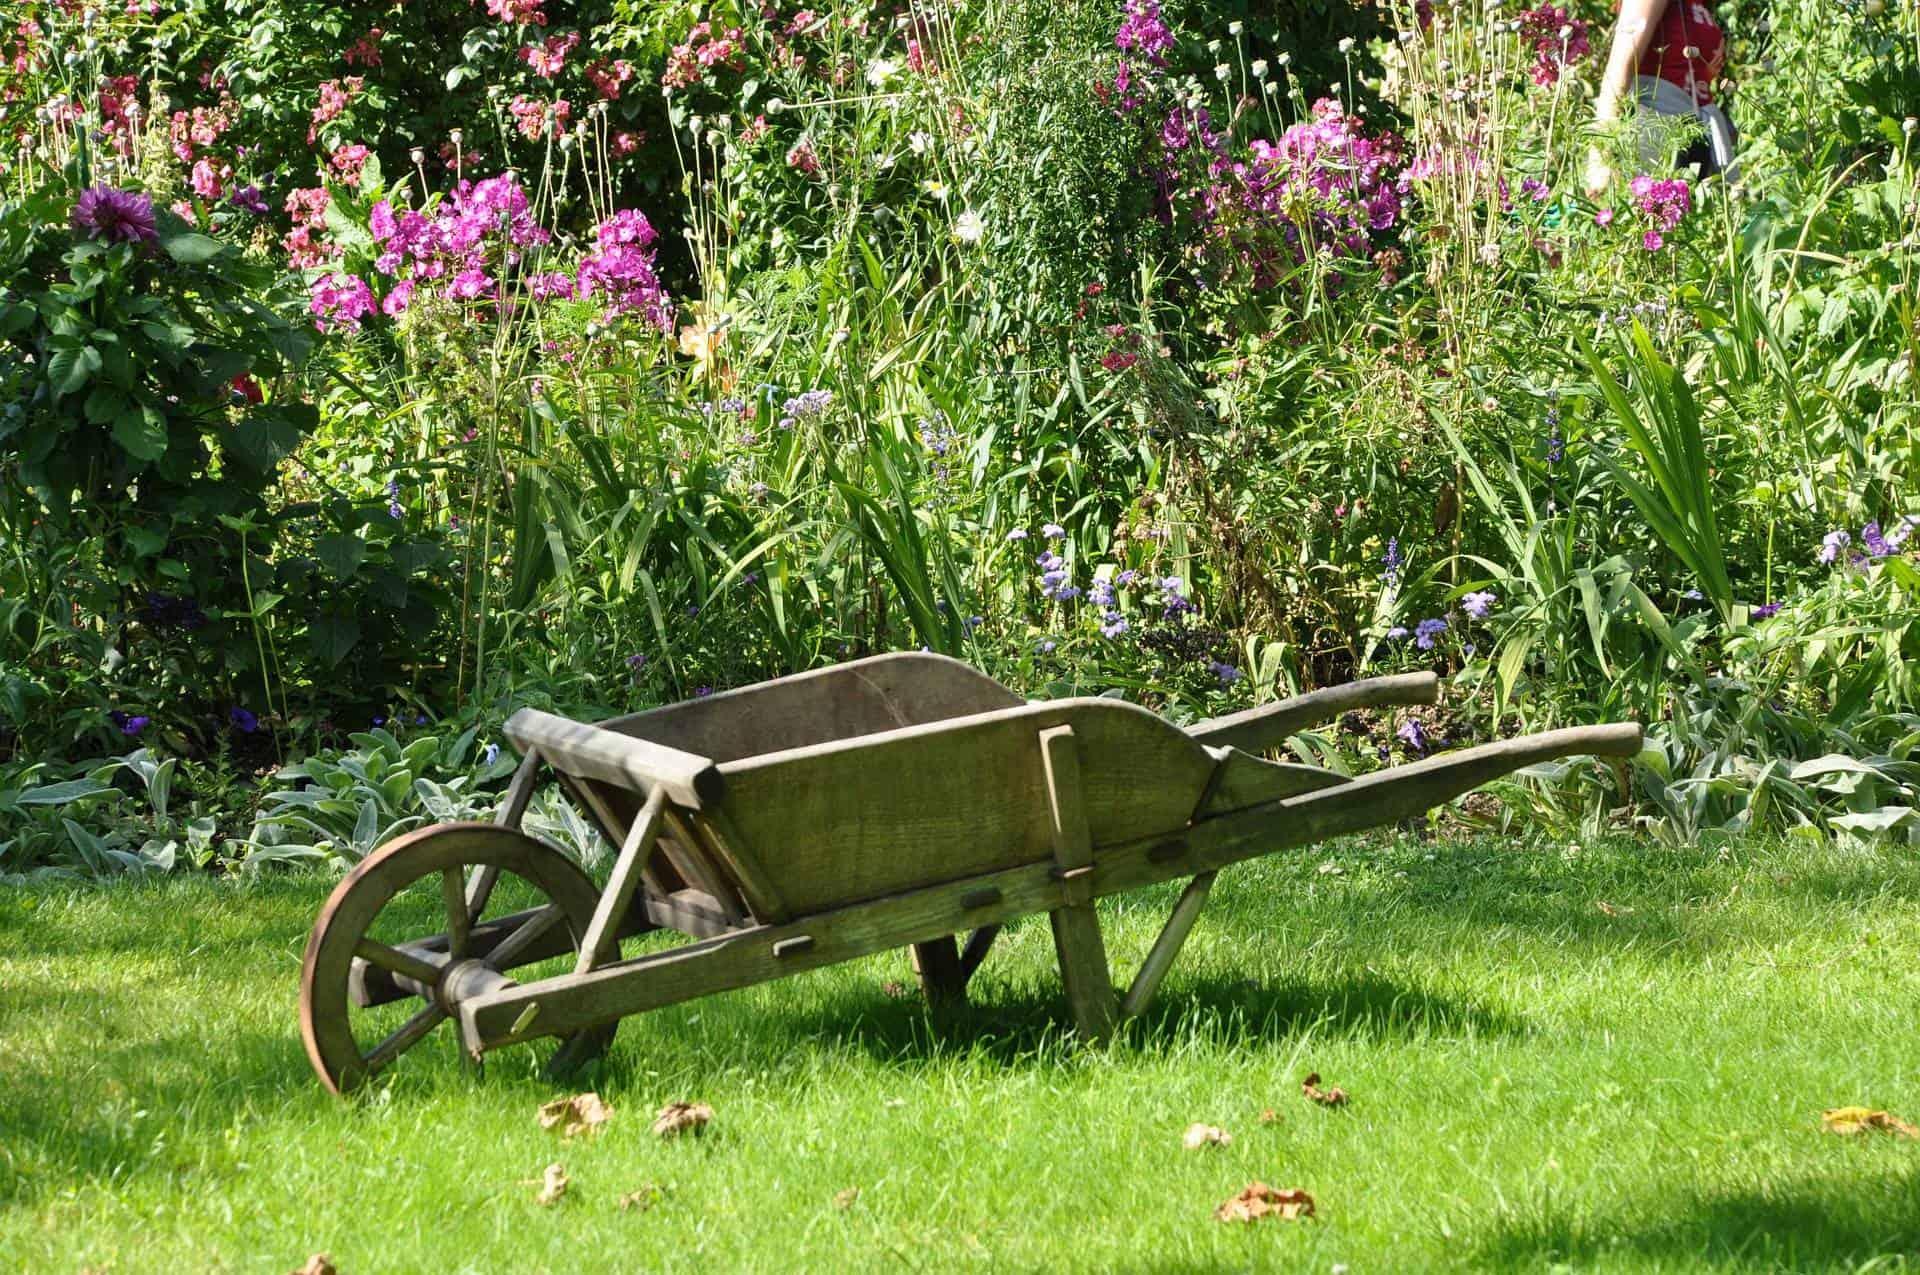 Garden Ready for Summer